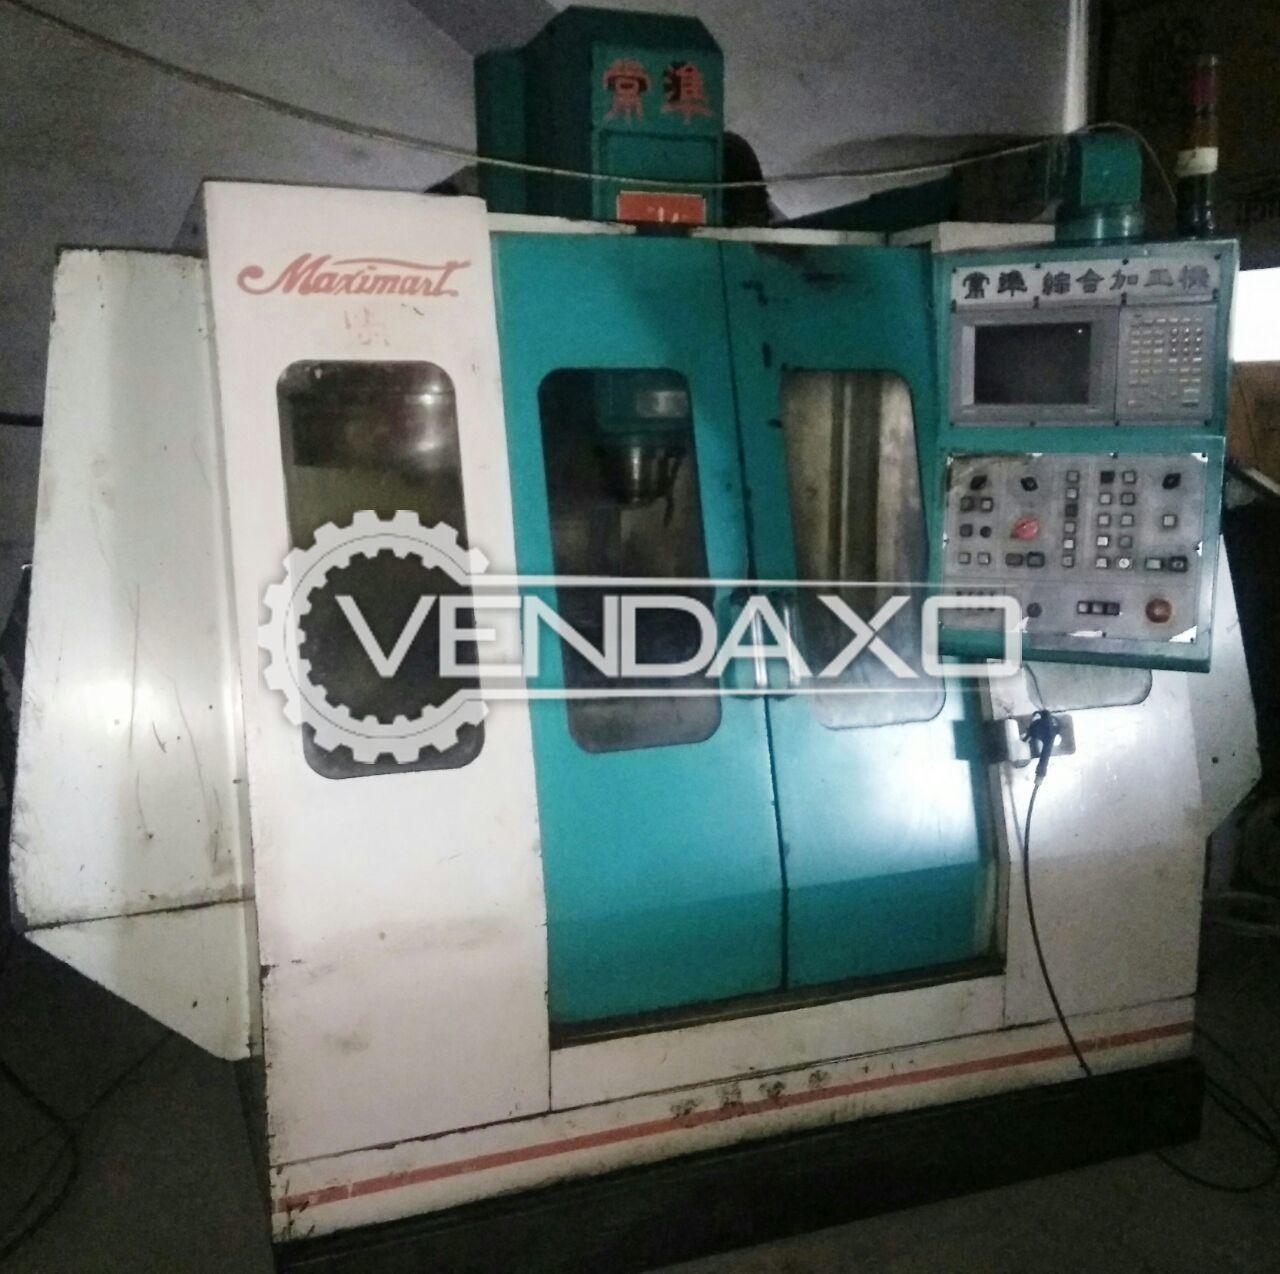 Maximart MC-85-E CNC Vertical Machining Center